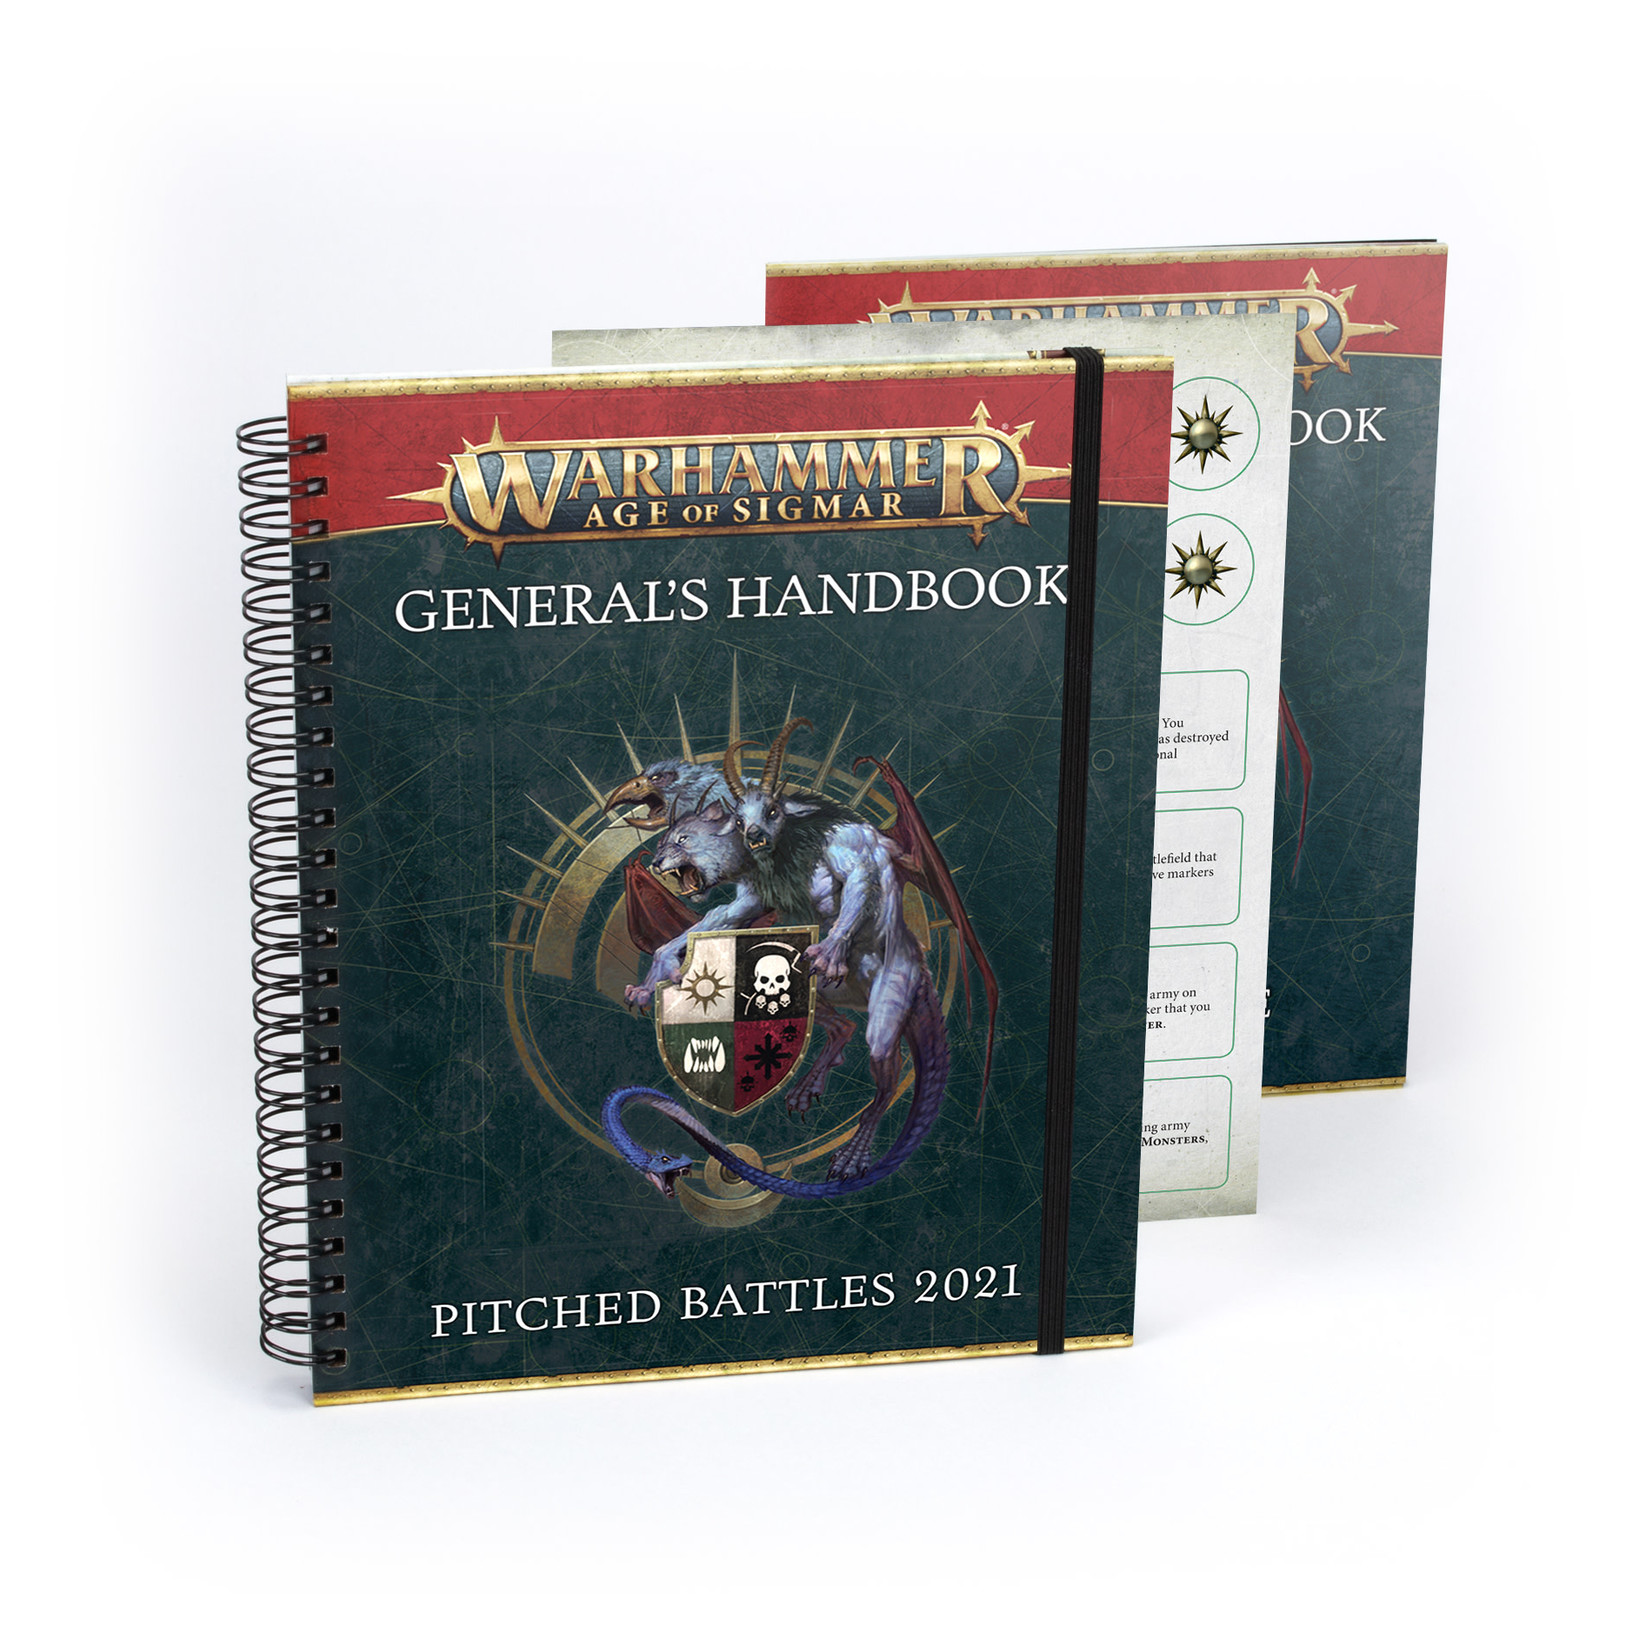 Games Workshop Warhammer Age of Sigmar: General's Handbook - Pitched Battles 2021